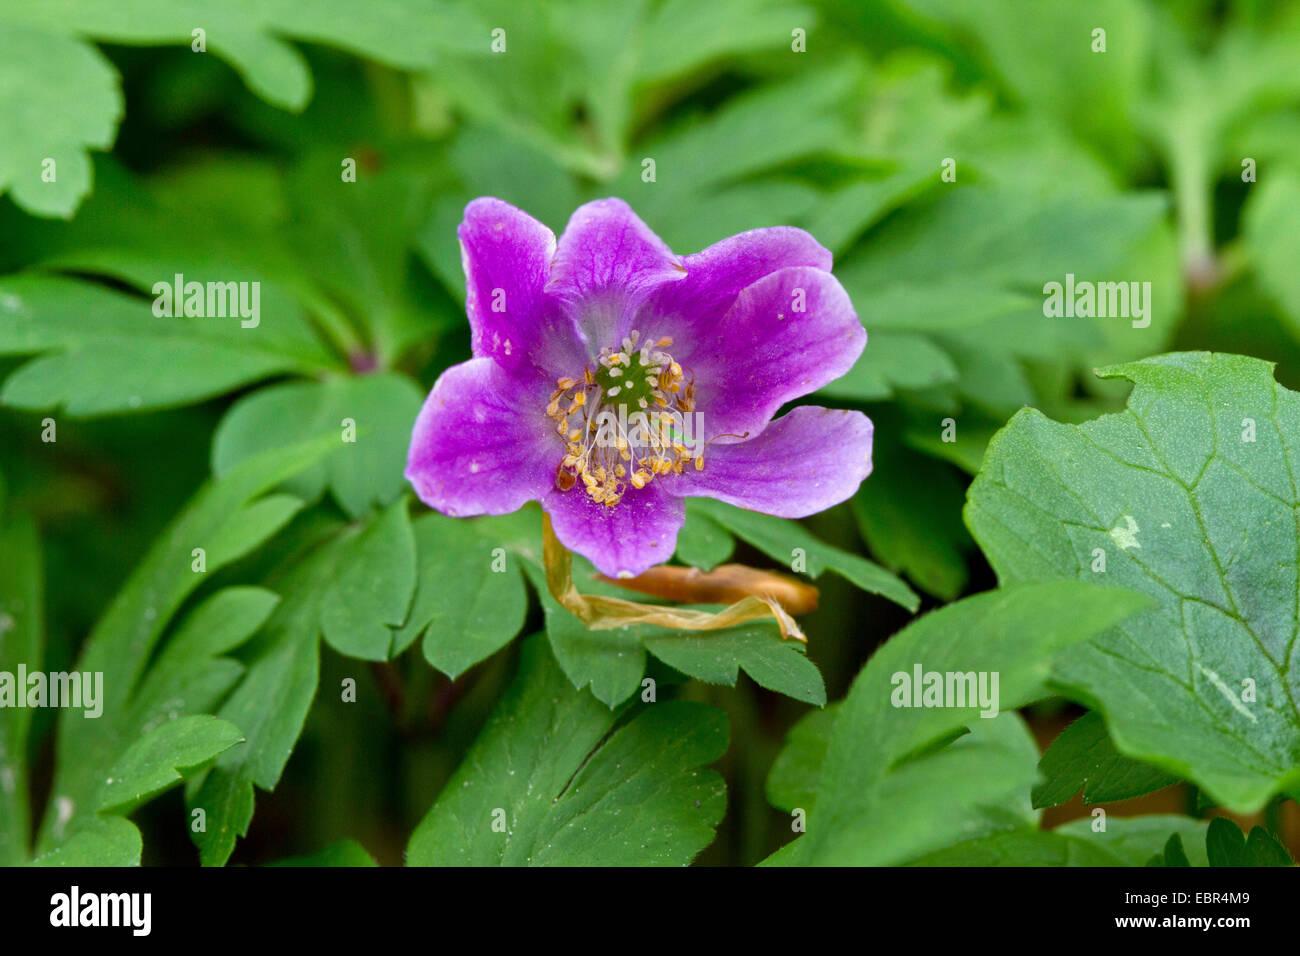 wood anemone (Anemone nemorosa), with violett flowers, Germany - Stock Image